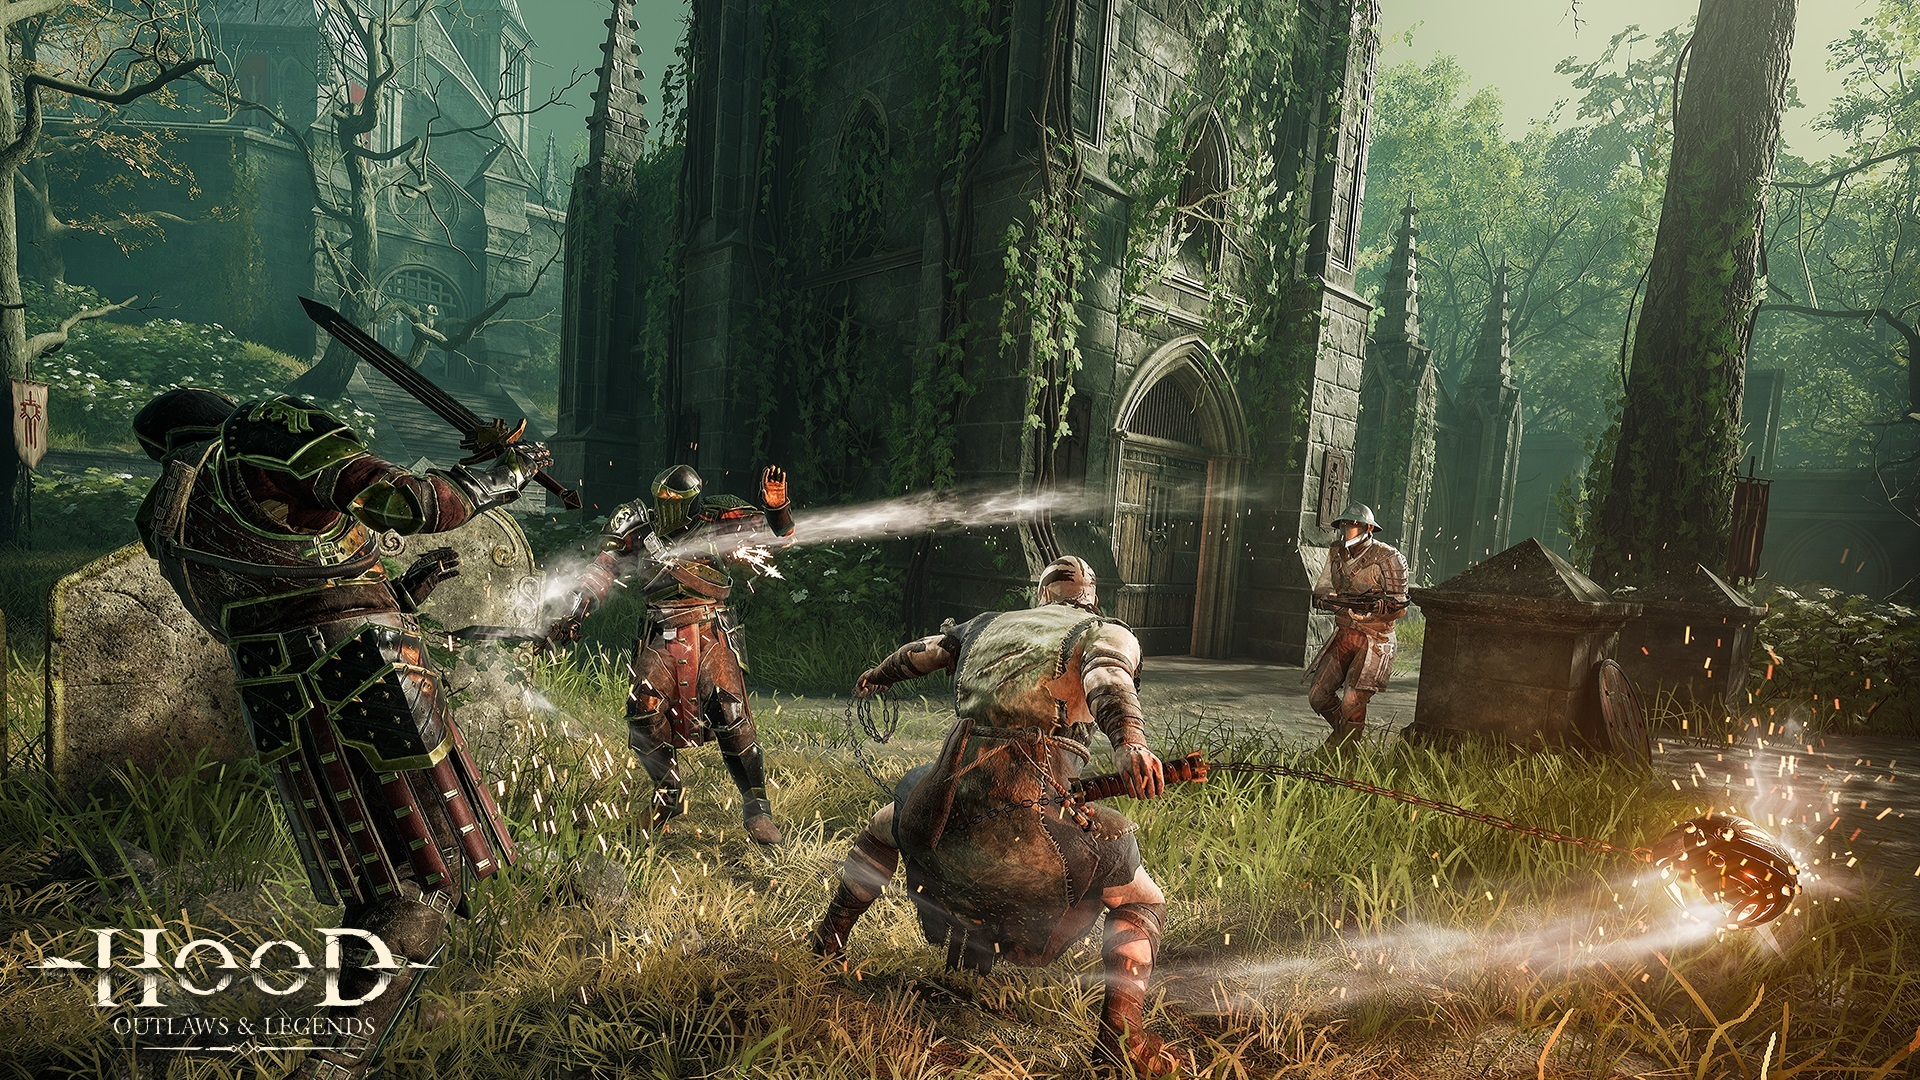 Critique de Hood Outlaws & Legends - Un vol de haute volée - Gamebro.cz